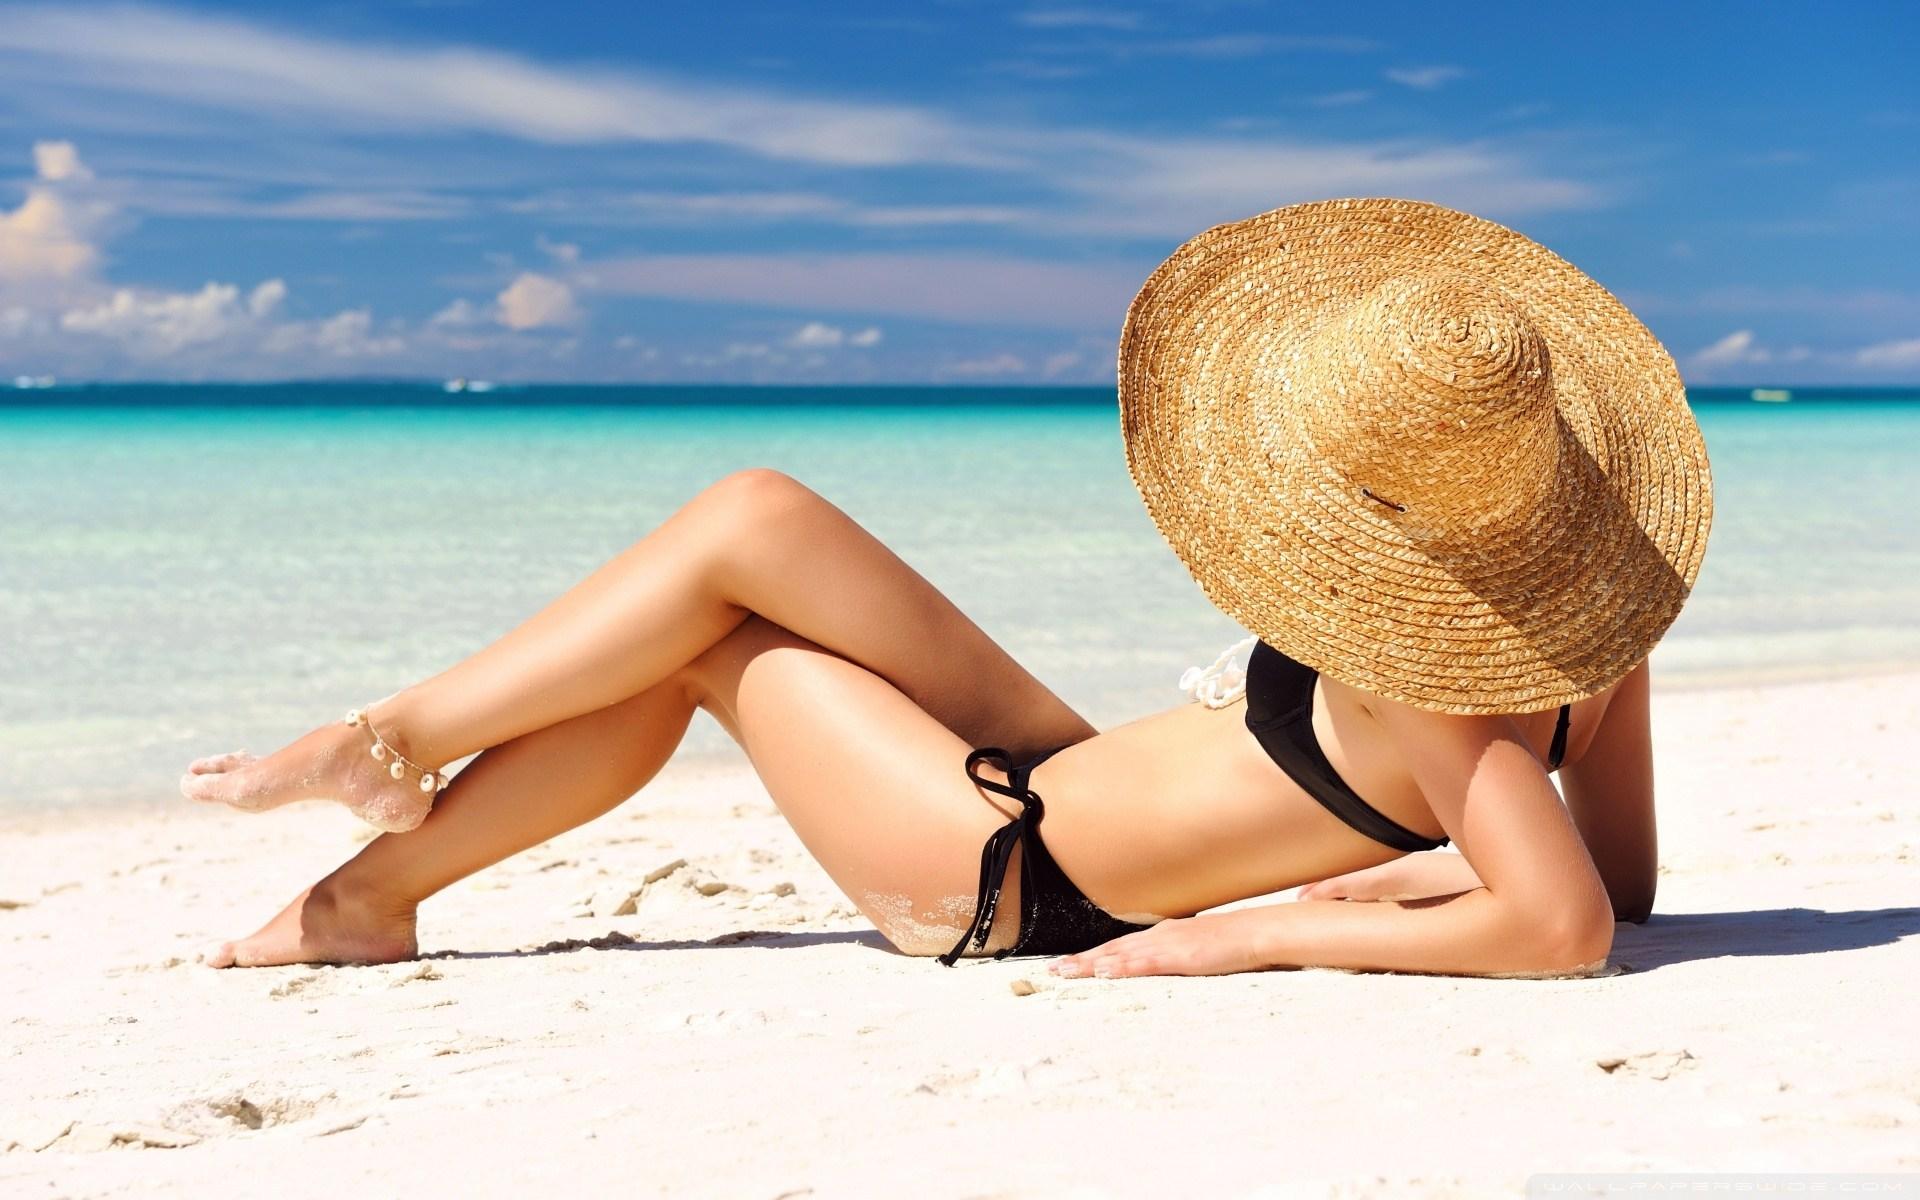 sunbathing_on_the_beach-wallpaper-1920x1200.jpg